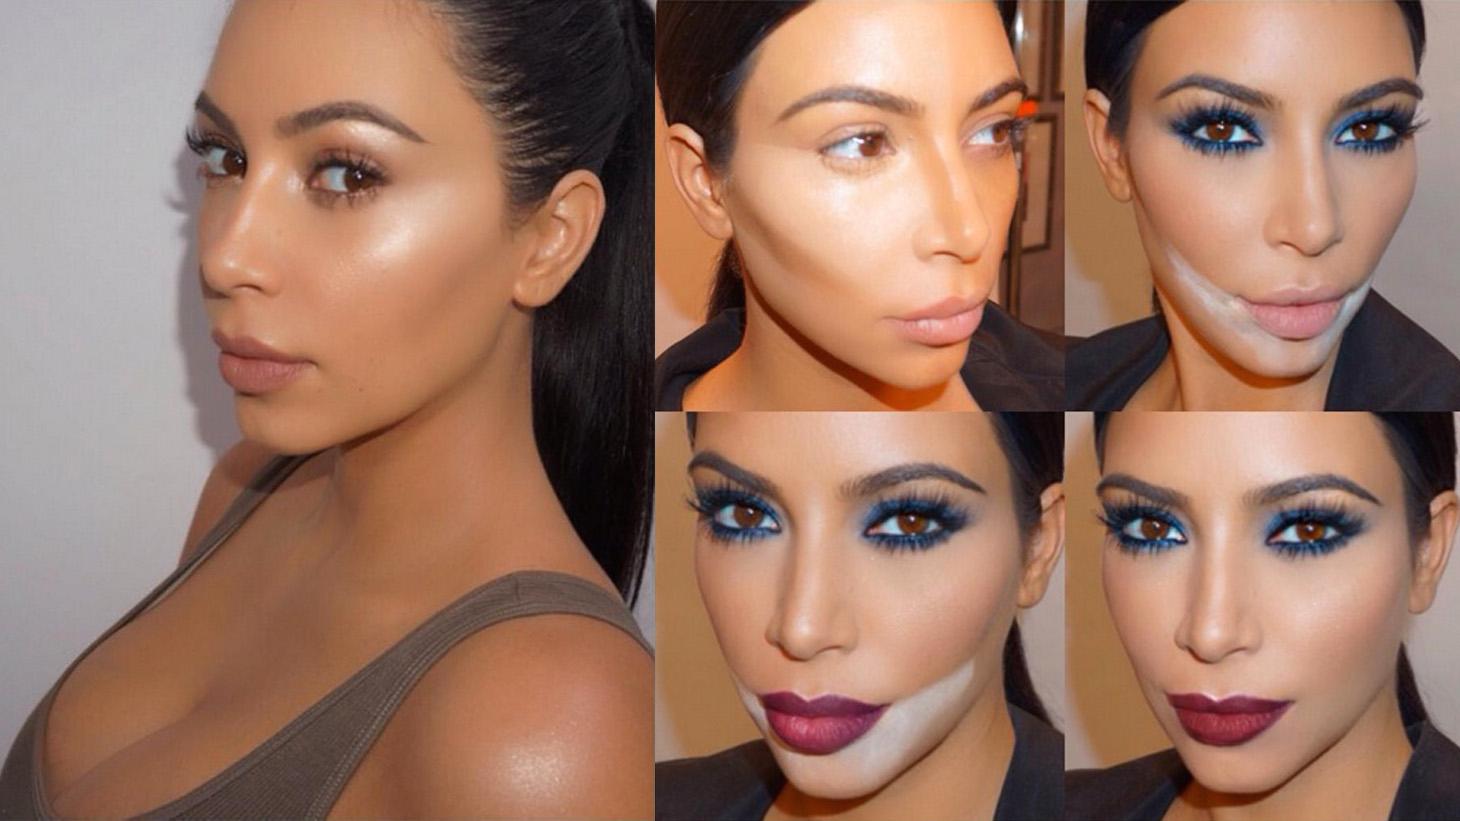 Kim kardashians make up tutorials stylus innovation research kim kardashians make up tutorials stylus innovation research advisory baditri Gallery